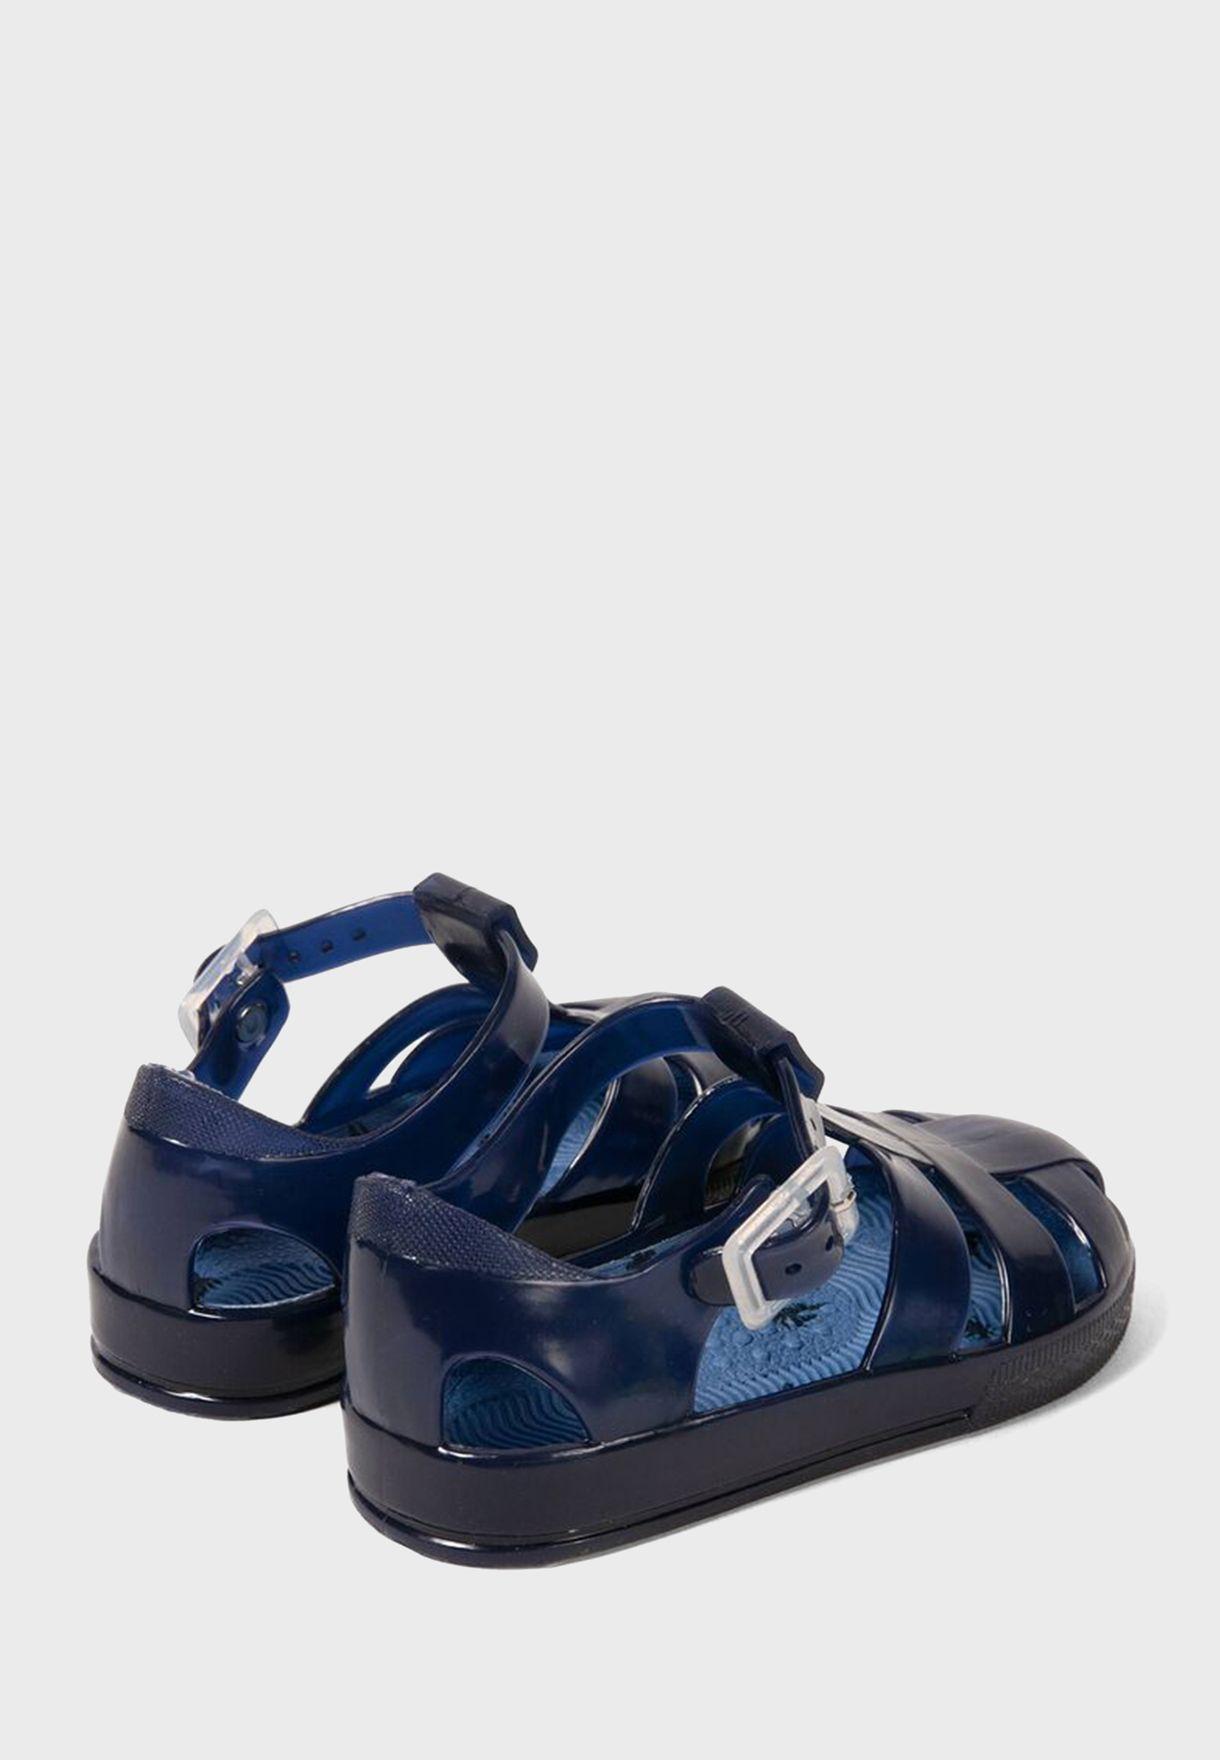 Infant Kids Velcro Sandals